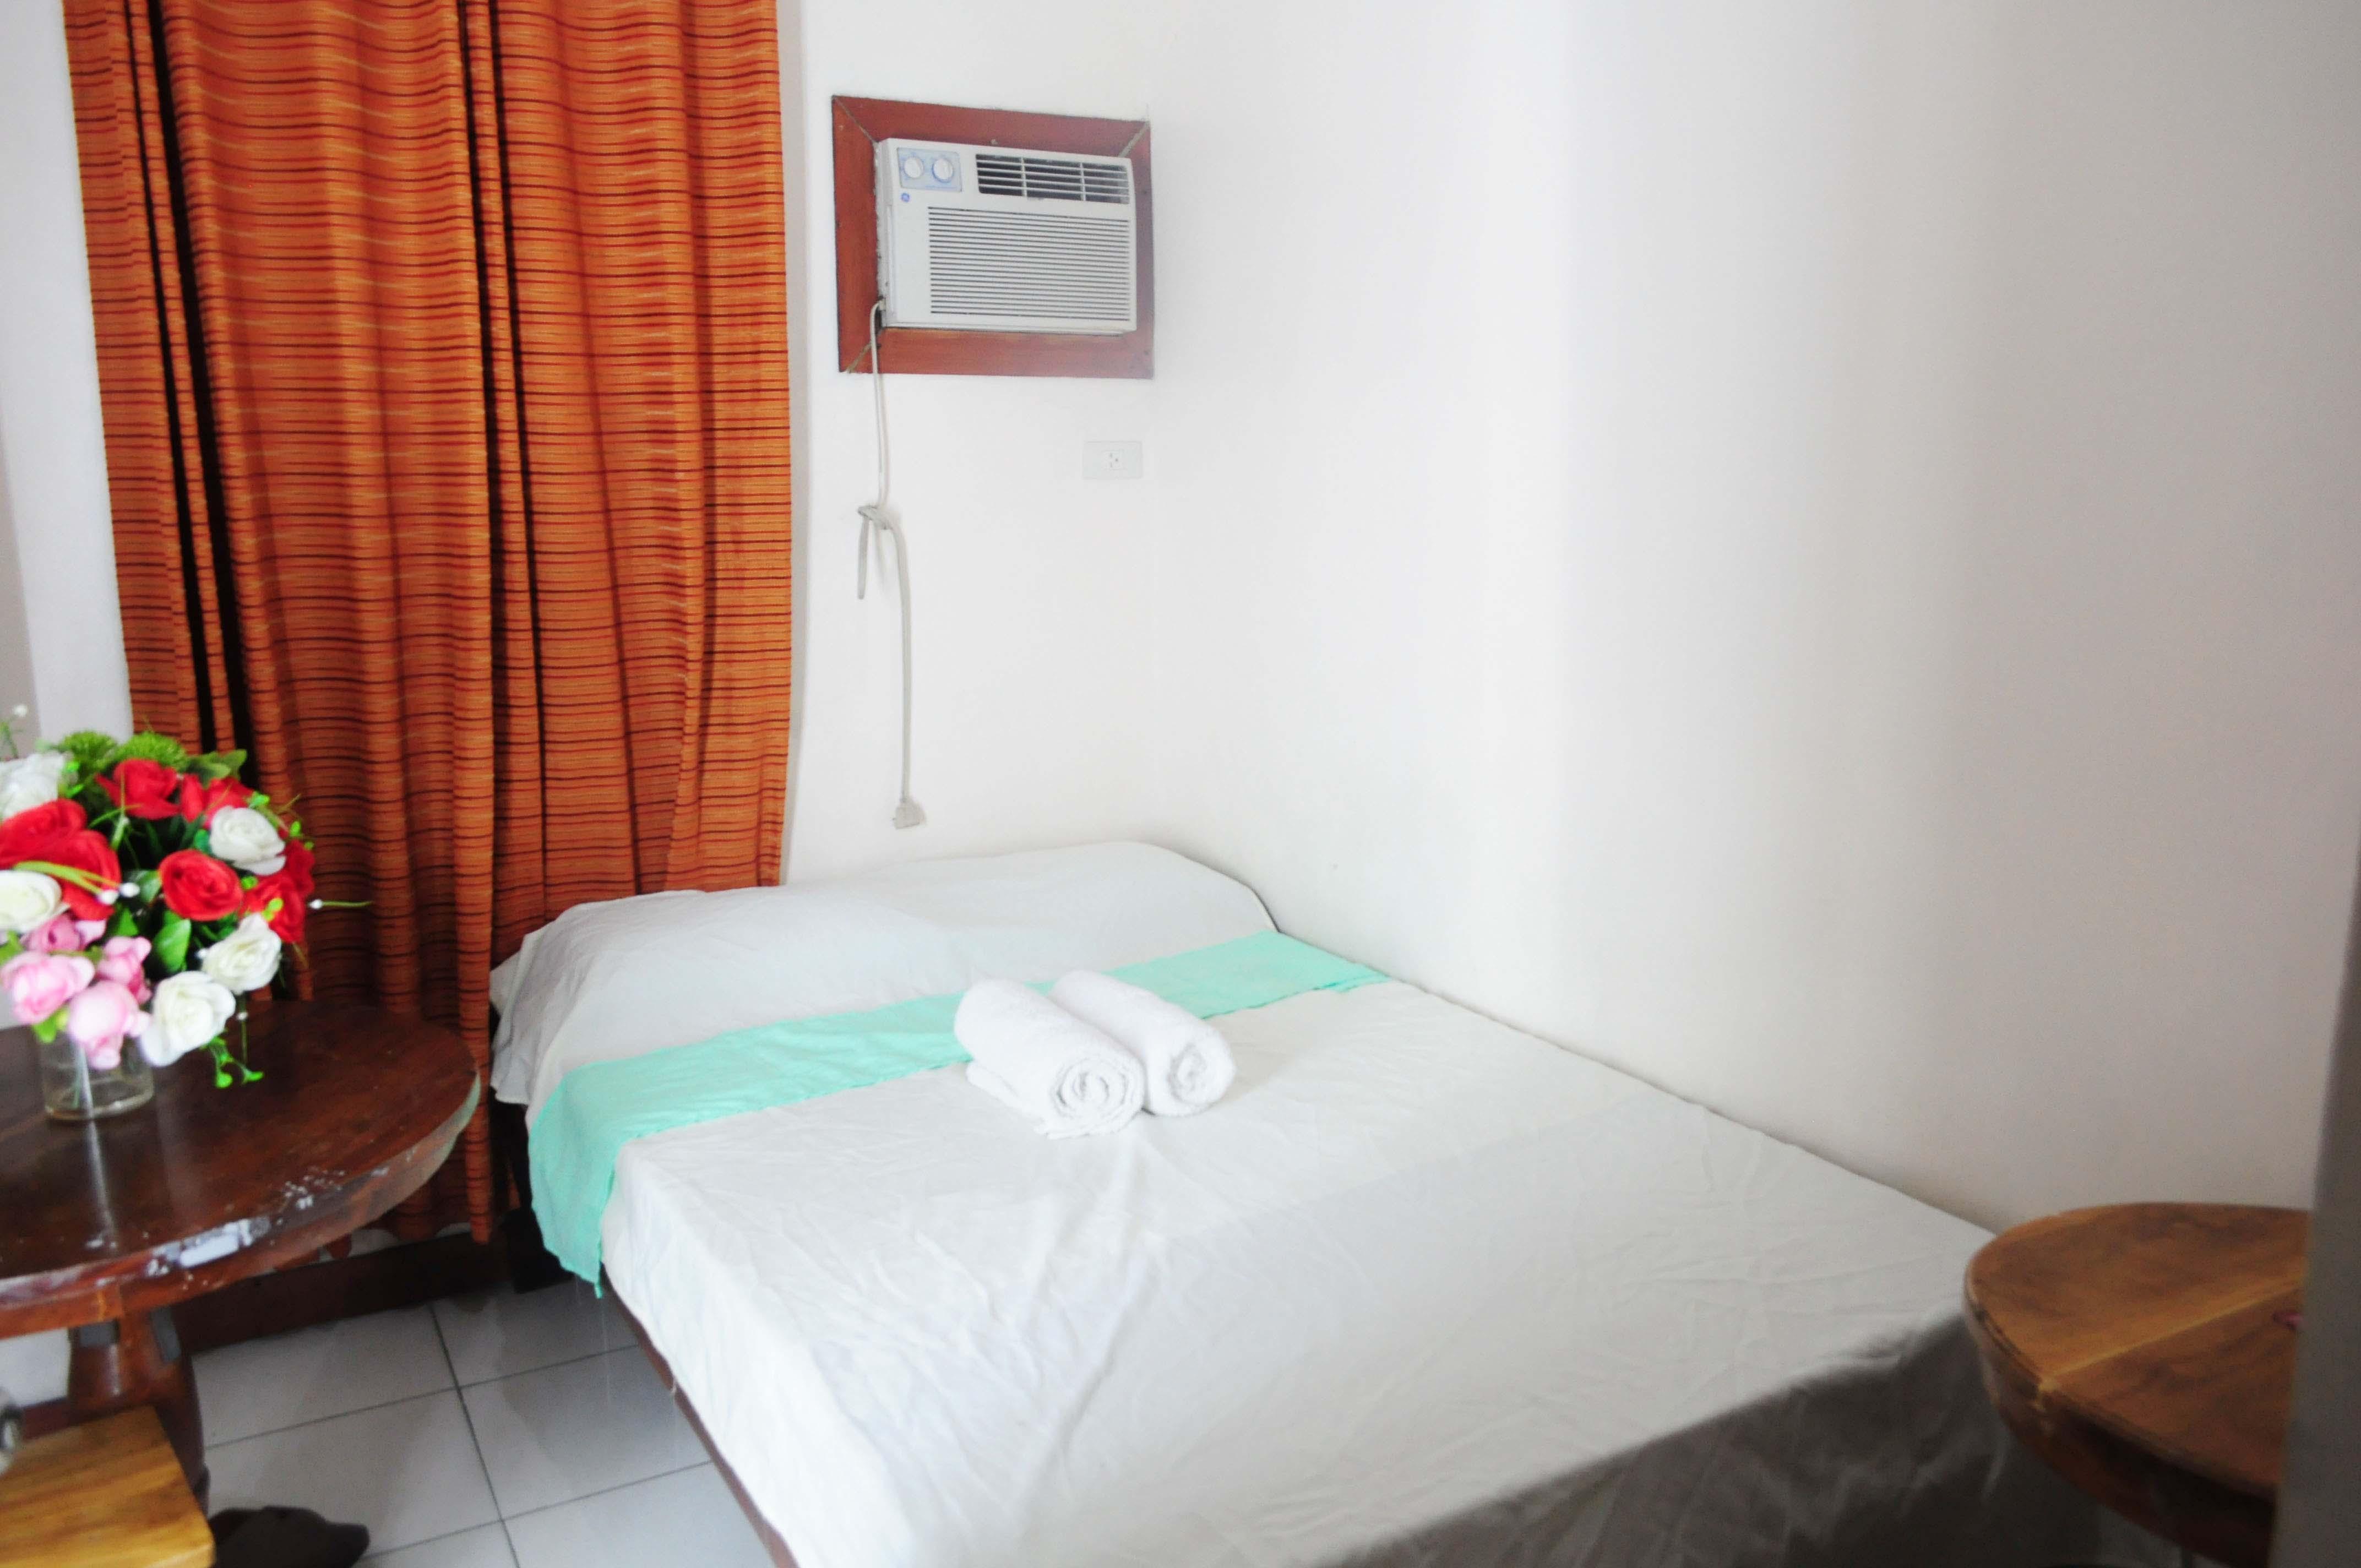 Standard Room-Rooms498